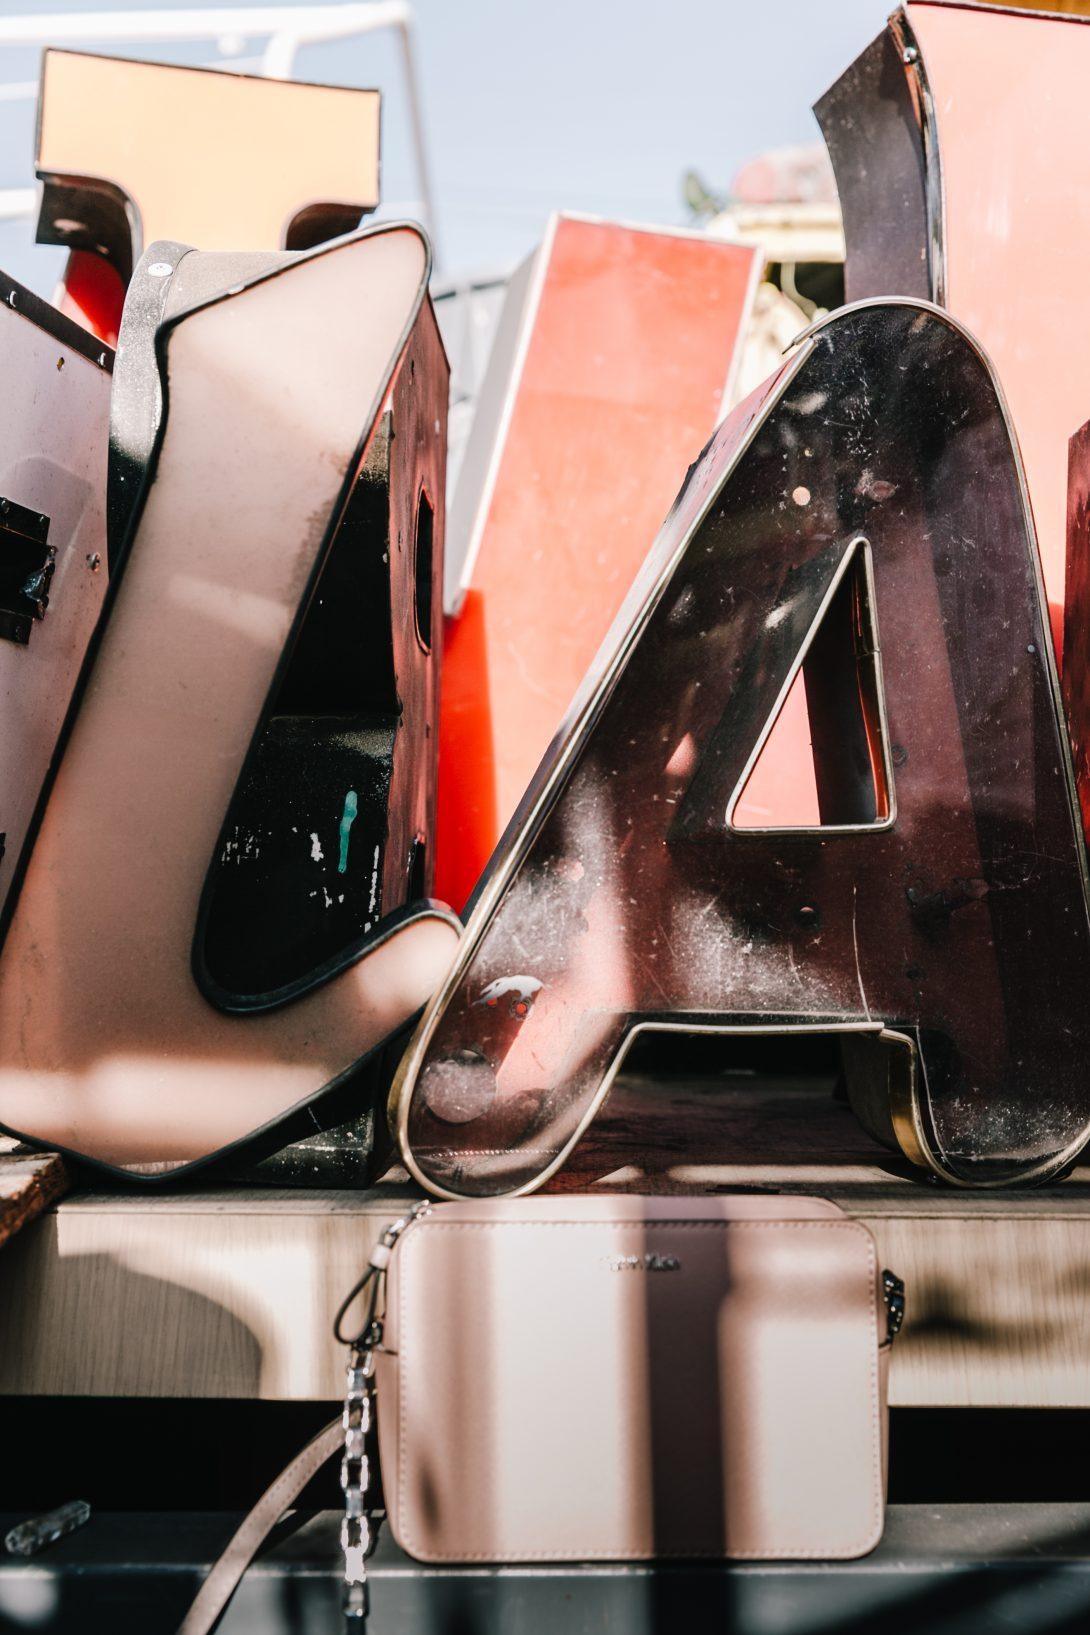 Calvin_Klein-Denim_Skirt-CK_Collection-Los_Angeles-Nick_Metropolis-Saint_Laurent_Sneakers-Pink_Bag-Outfit-Collage_Vintage--20